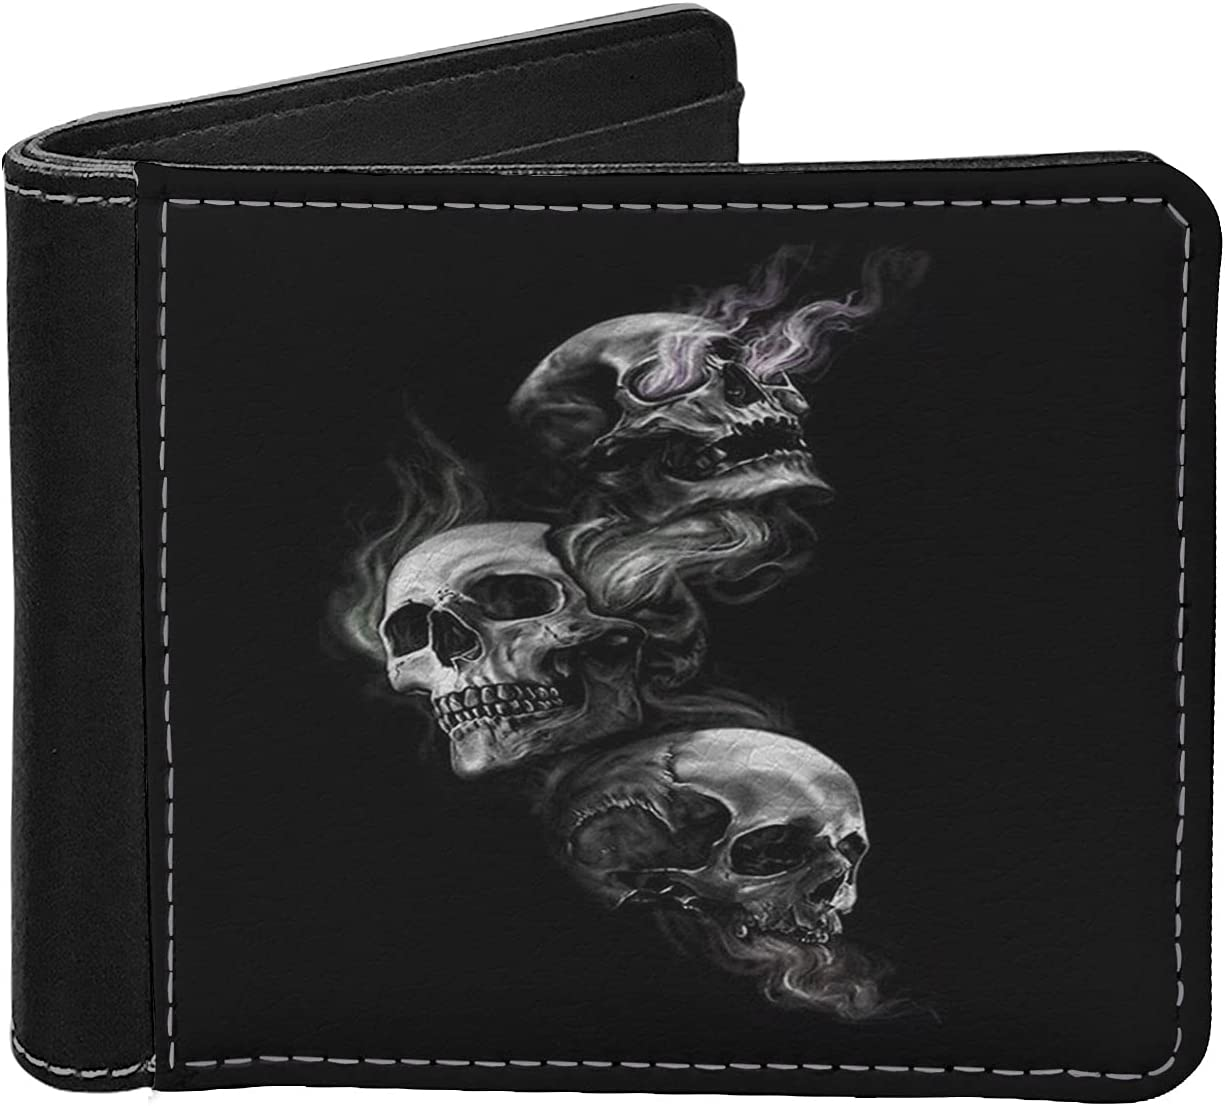 Binienty Black Overseas parallel import regular item Smoke Skull Limited time trial price Print Durable Mens Novelty Wallets L